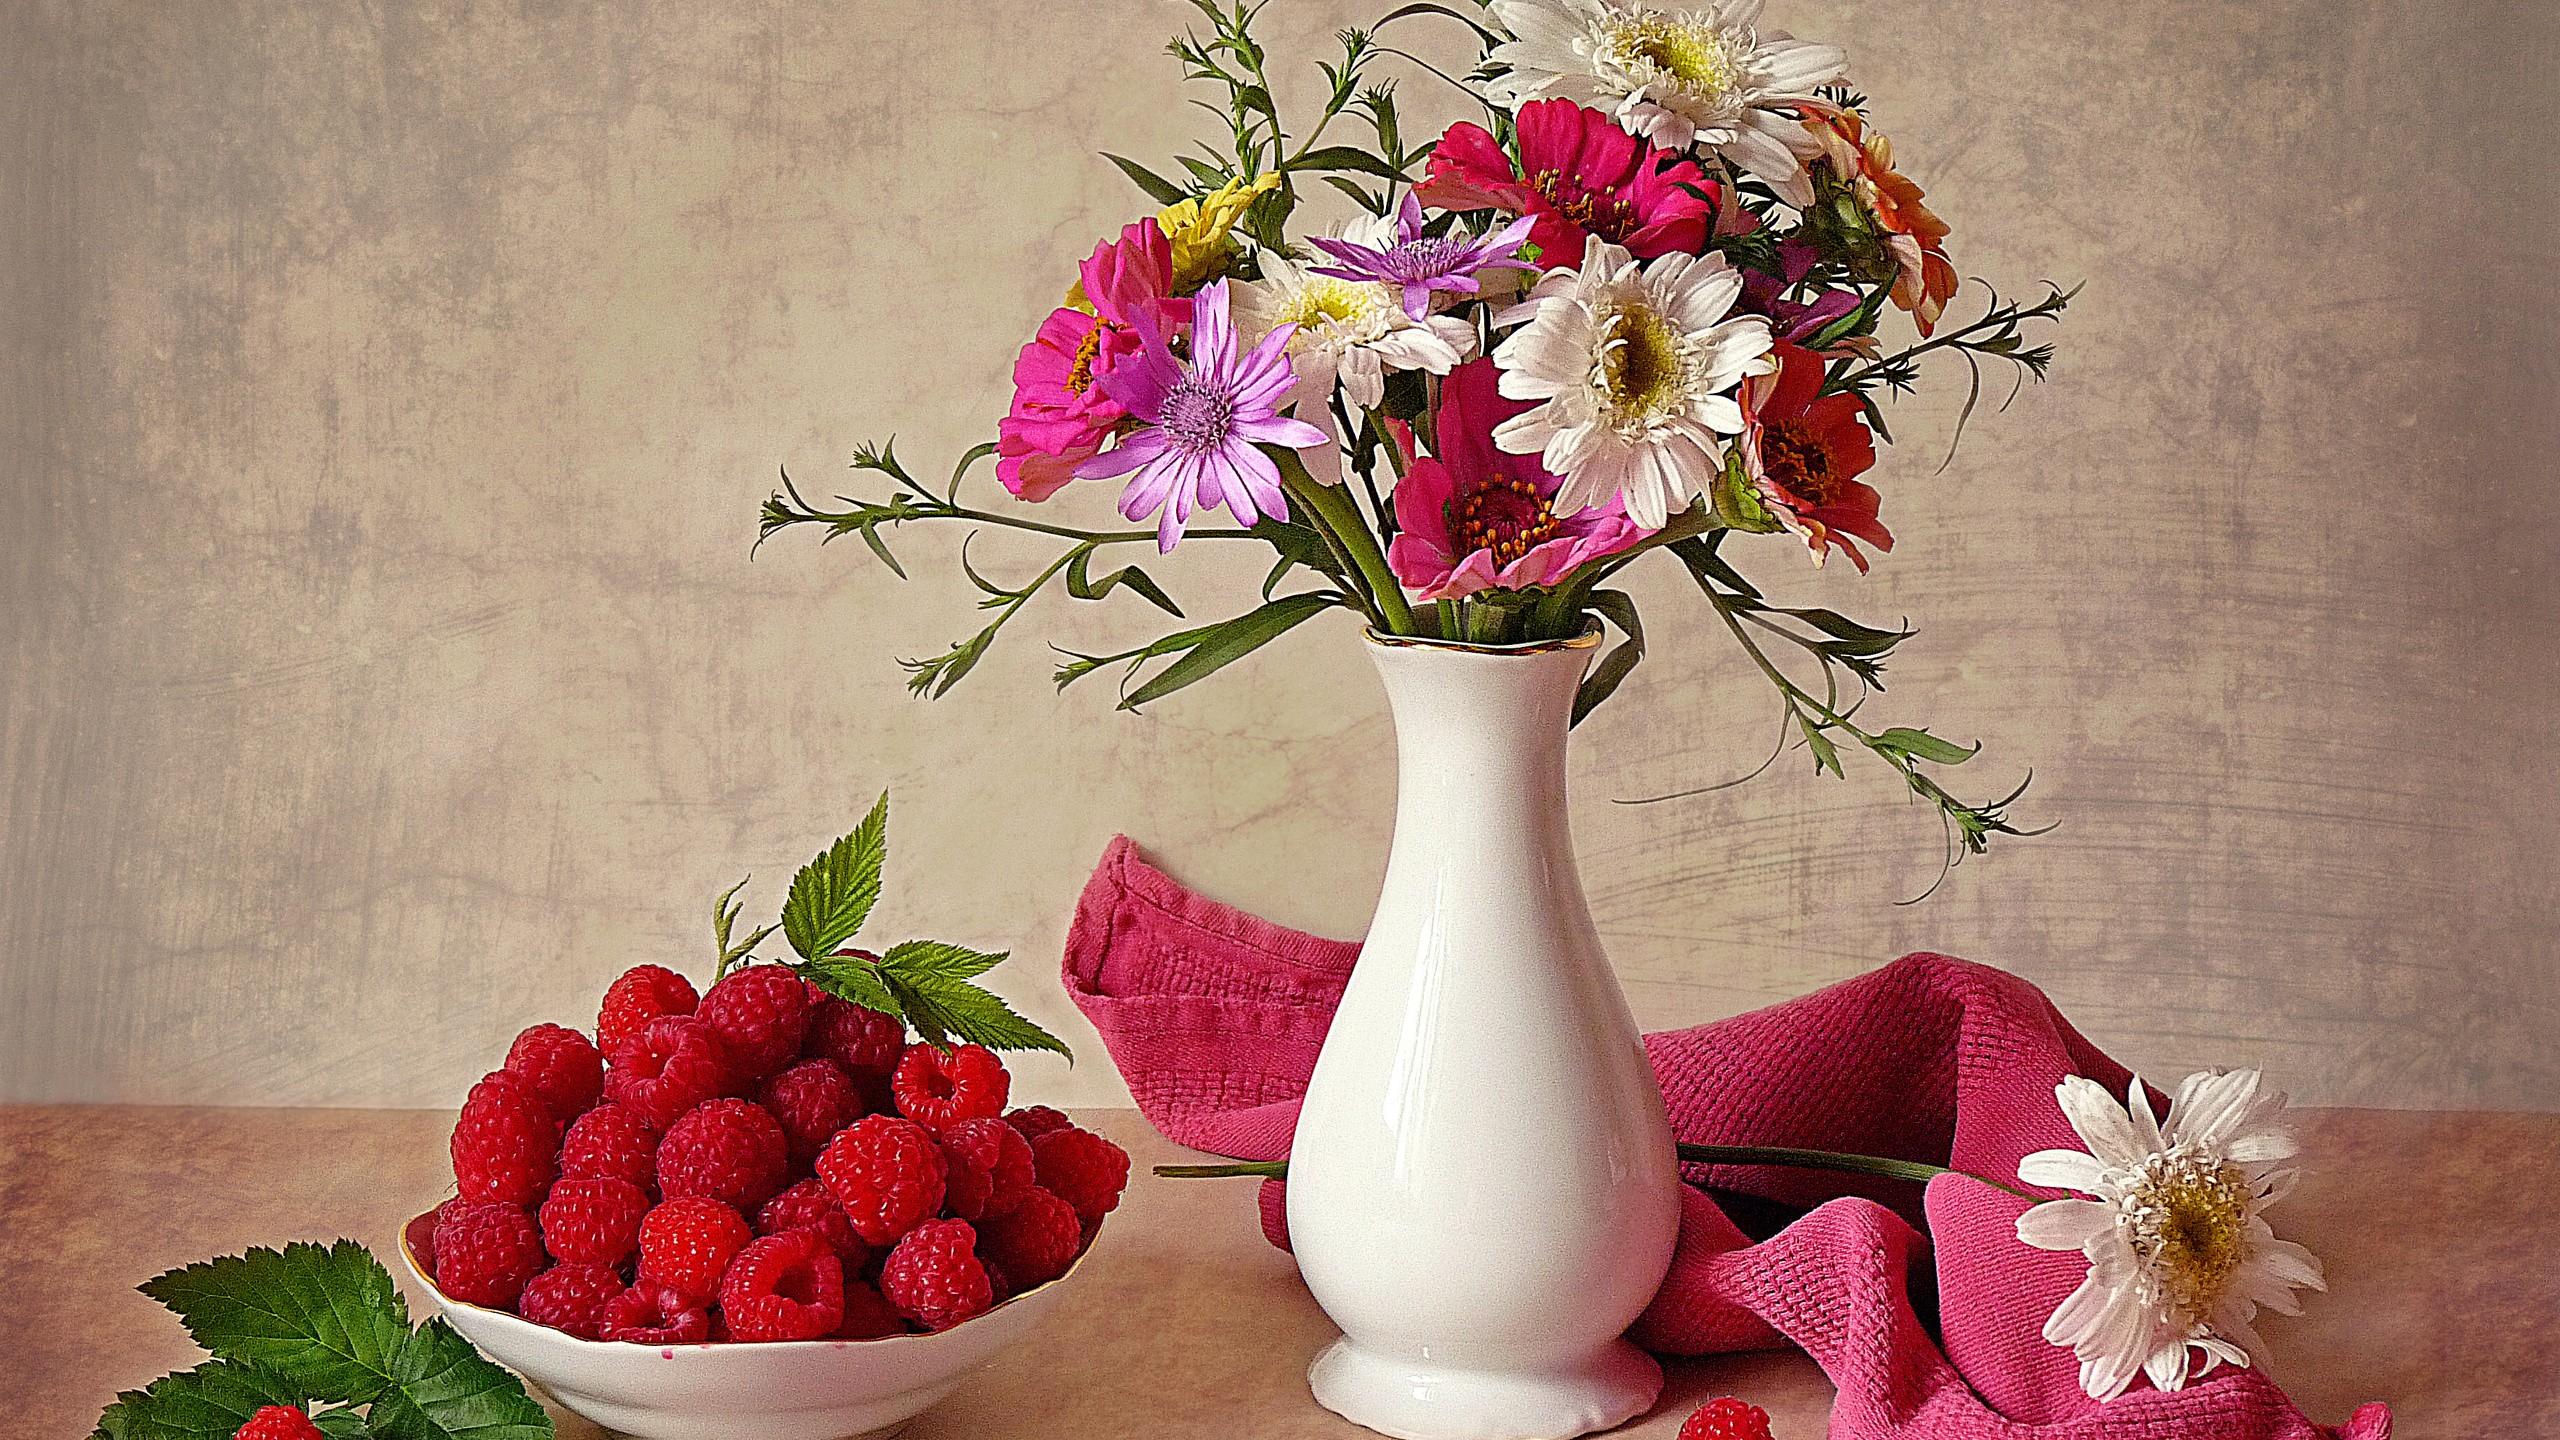 Wallpaper  painting red artwork vases fruit pink raspberries bouquets ART flora petal peony flowering plant floristry still life ... & Wallpaper : painting red artwork vases fruit pink raspberries ...